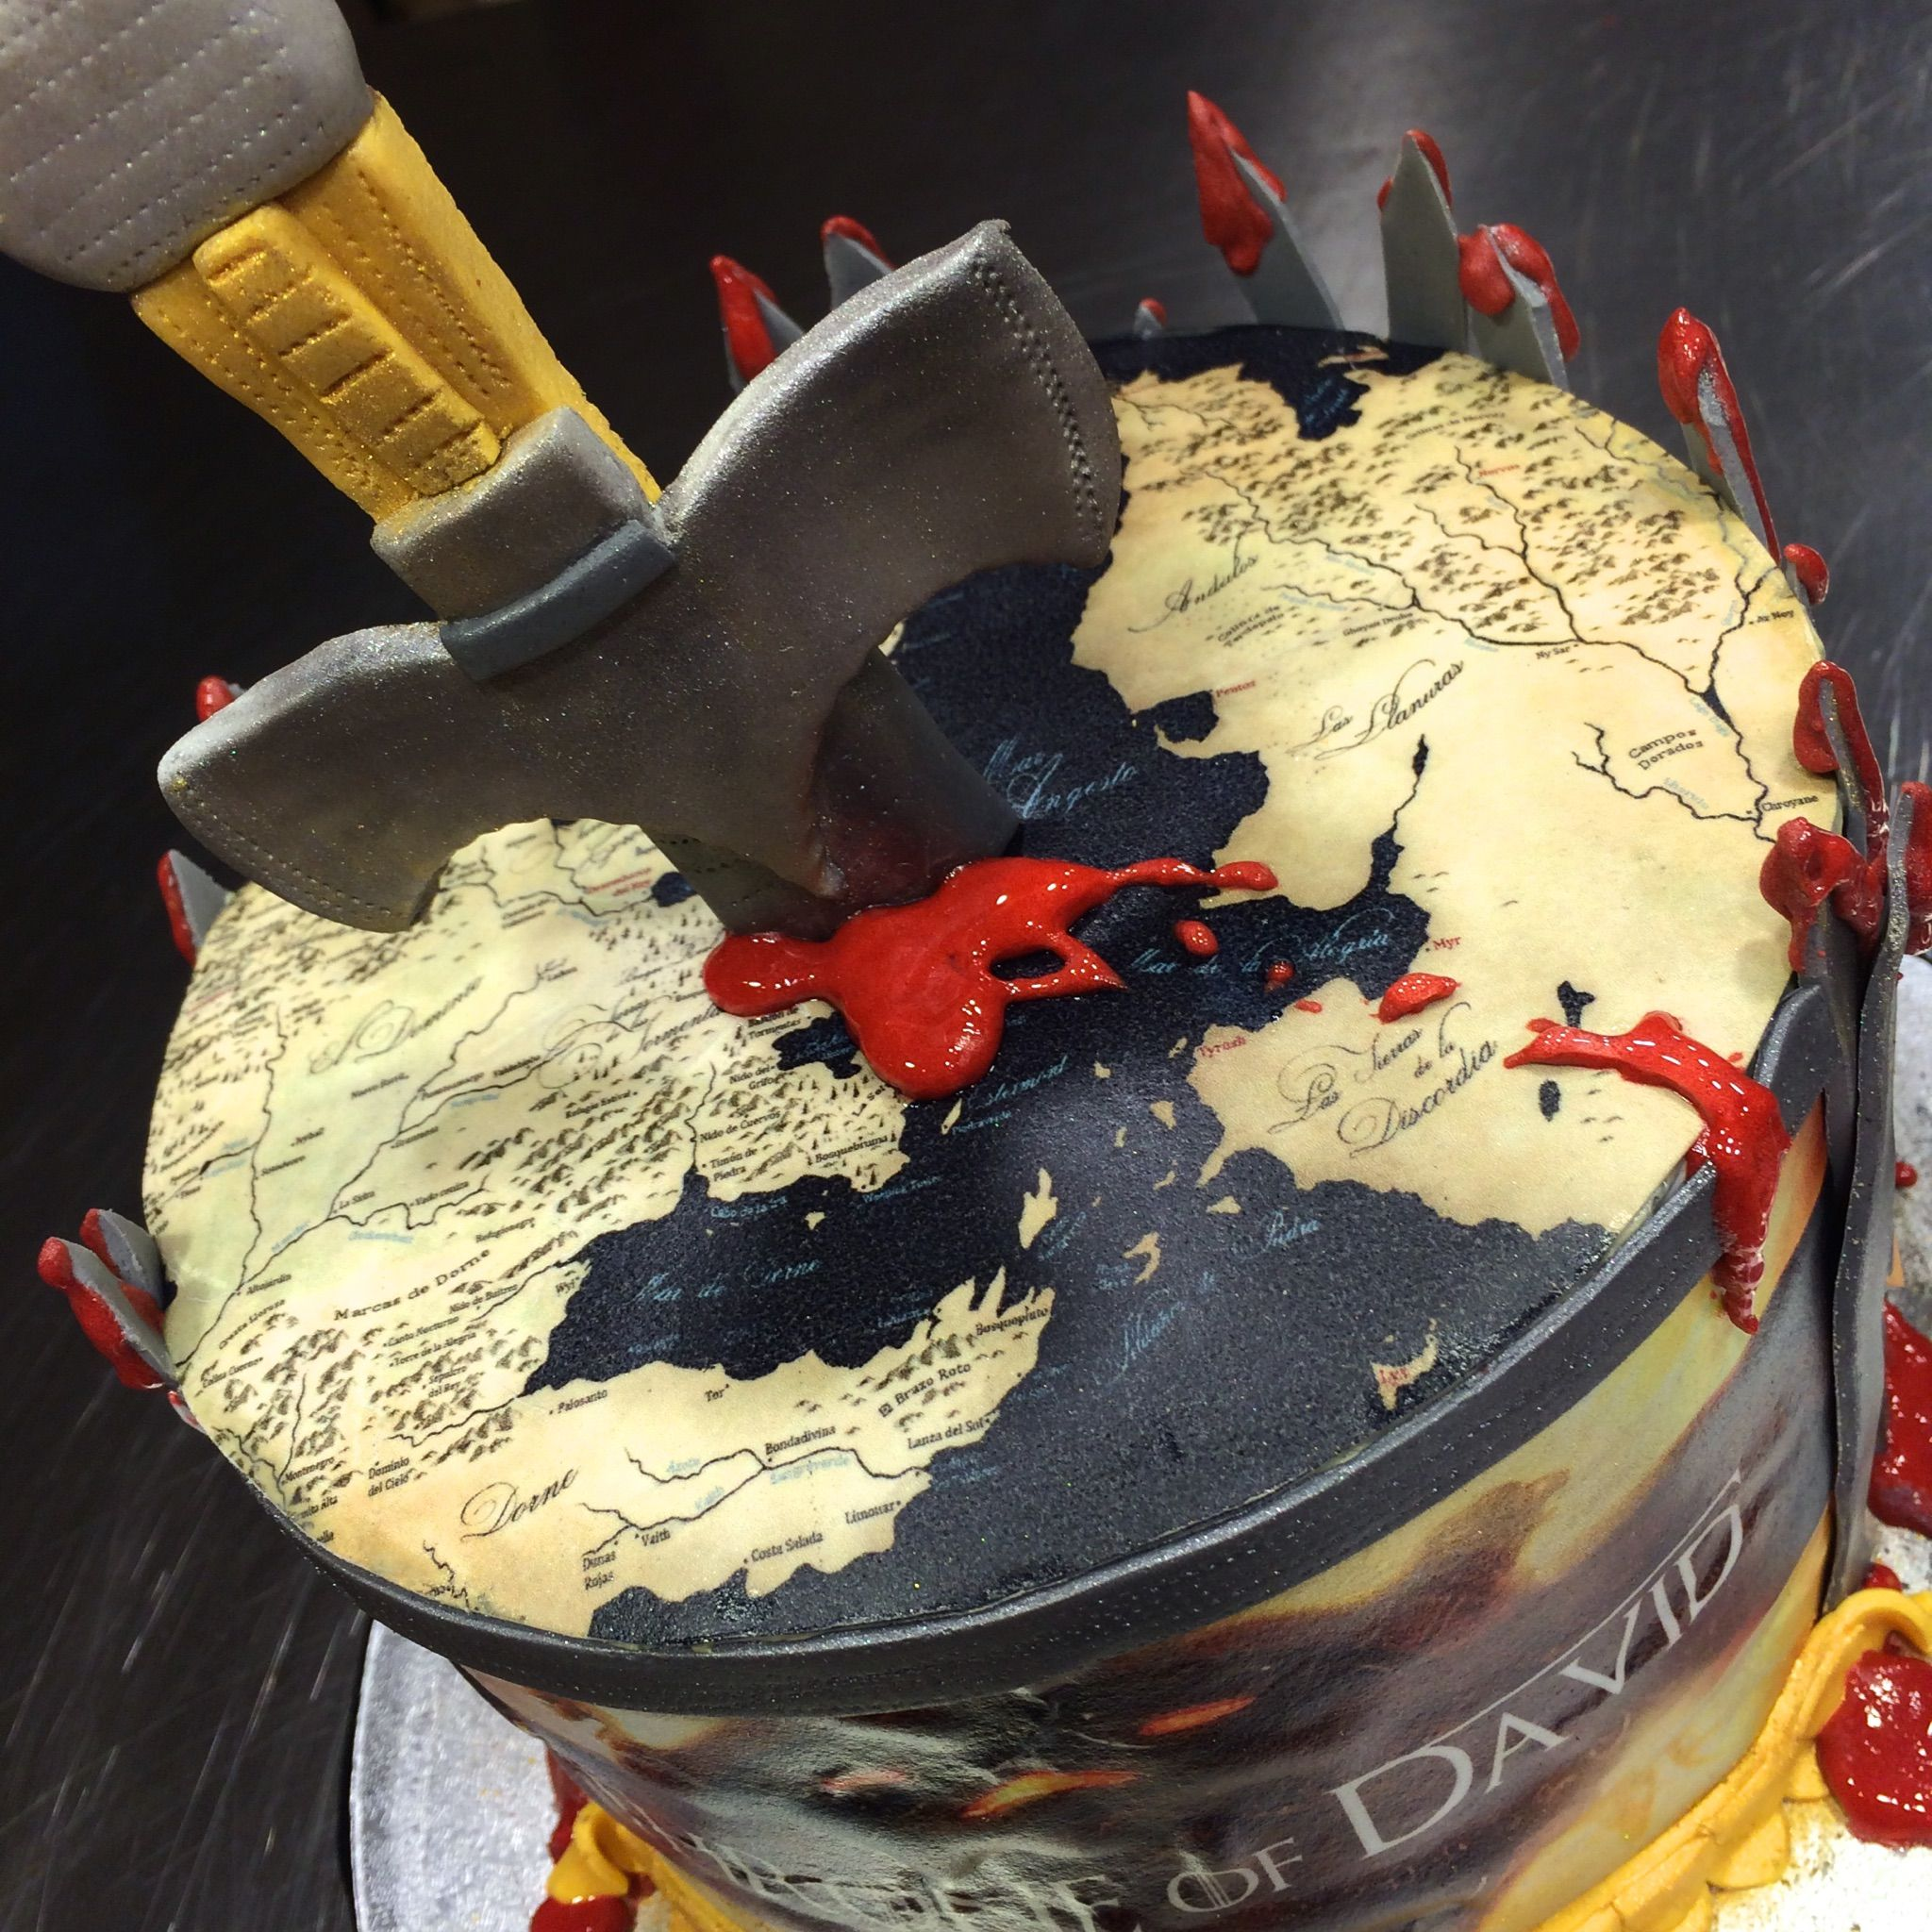 Tarta Juego De Tronos Game Of Thrones Cakes By Kemagdalenas Tarta De Juego De Tronos Juego De Tronos Catering Eventos